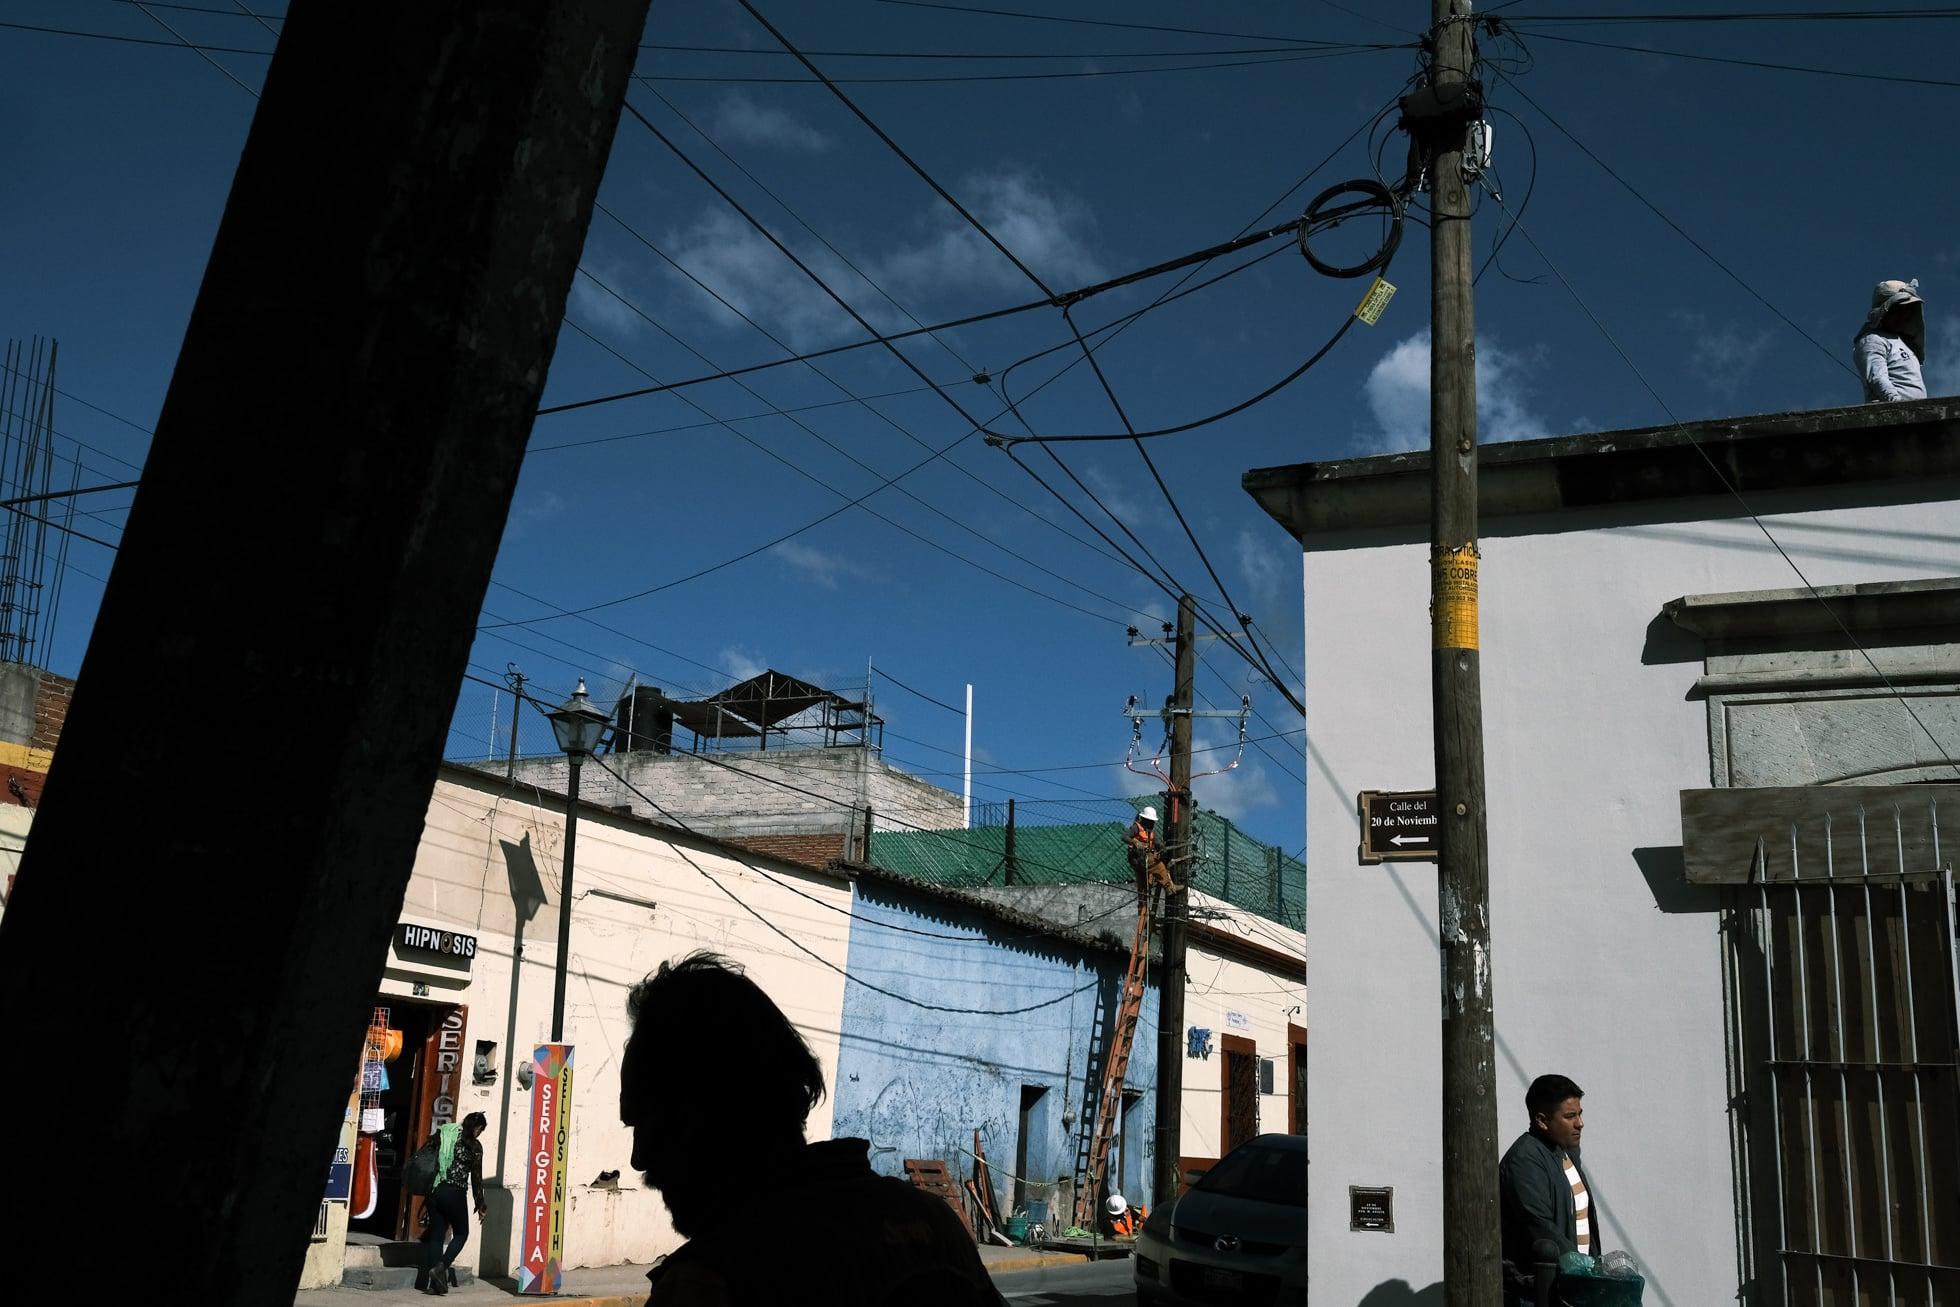 fujifilm-x-pro3-mexico-street-photography-47